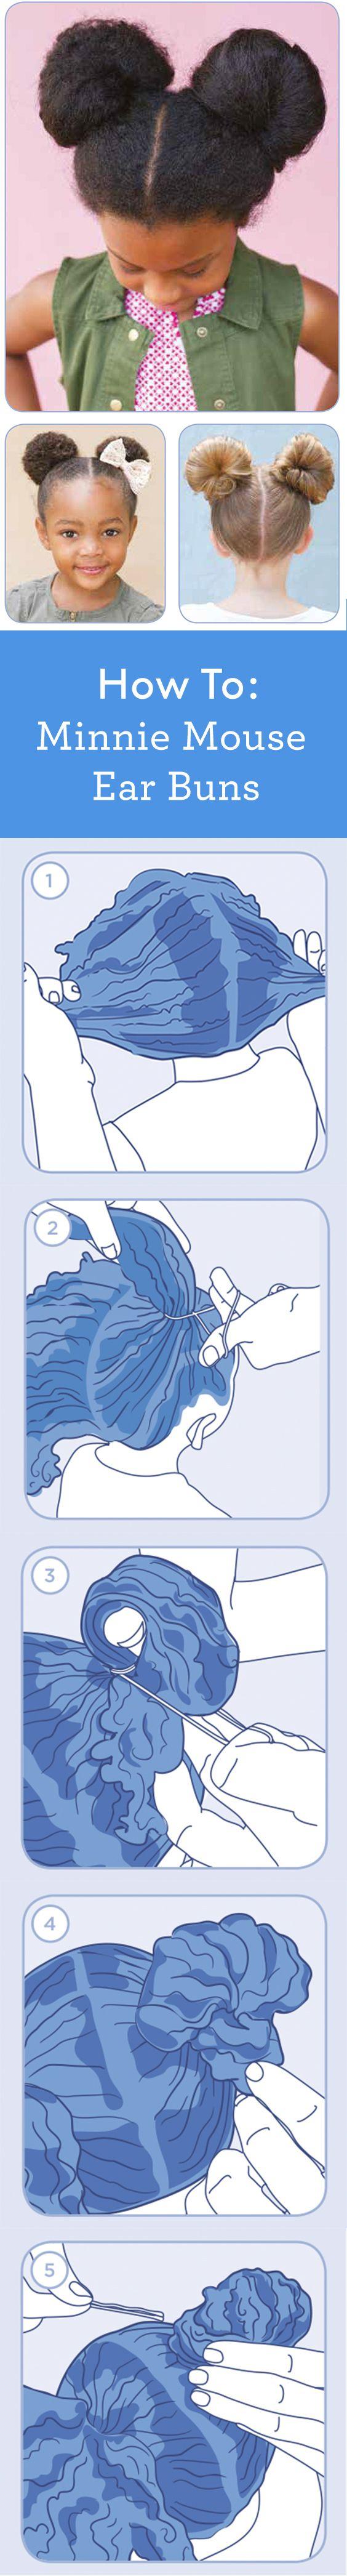 Best 25 Disney hairstyles ideas on Pinterest